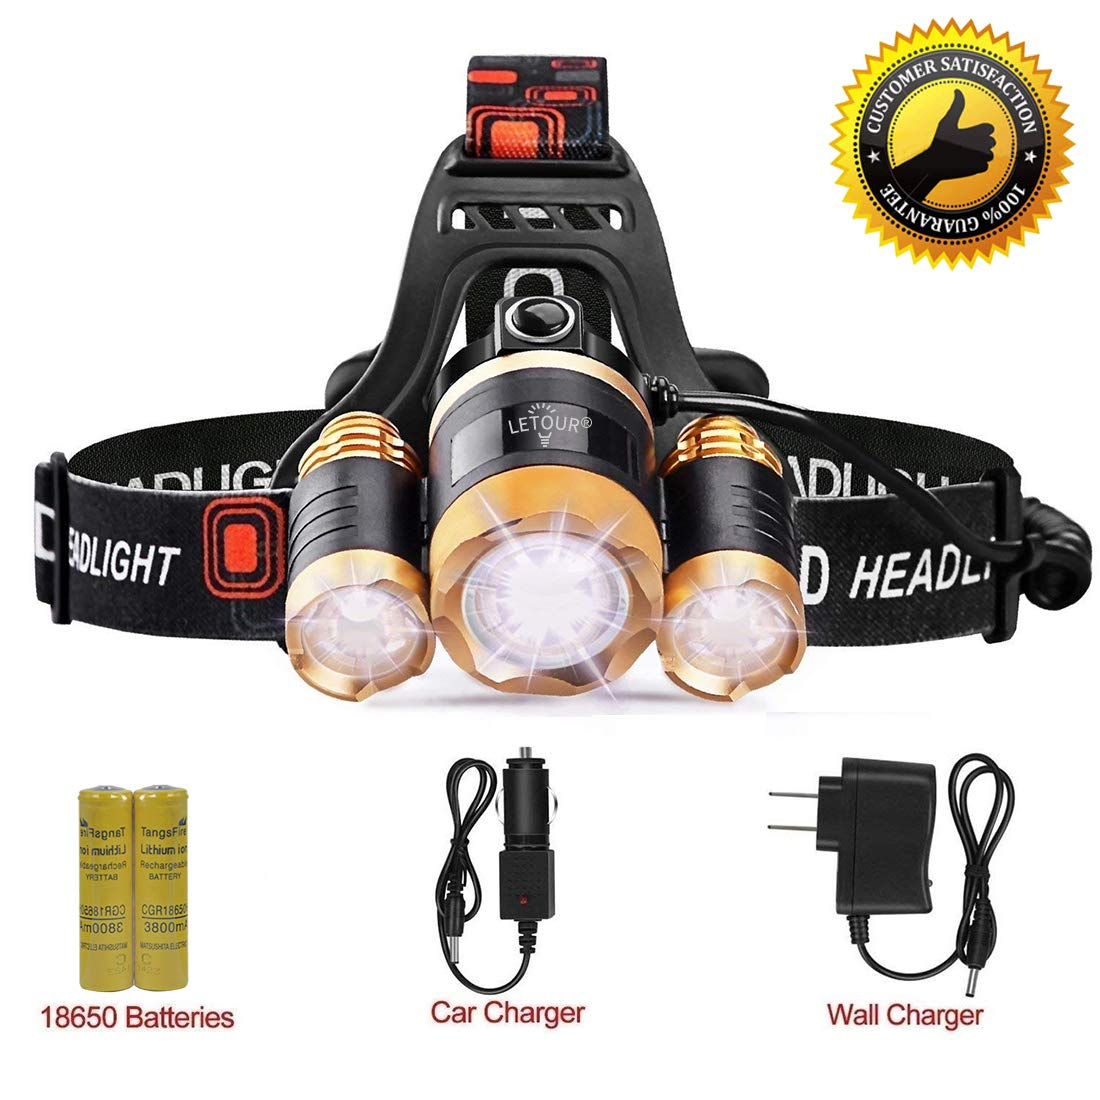 LETOUR Headlight, Brightest 6000 Lumen CREE LED Work Headlamp,18650 Rechargeable Waterproof Flashlight with Zoomable Head Light,Bright Head Lights for Camping Running Hiking